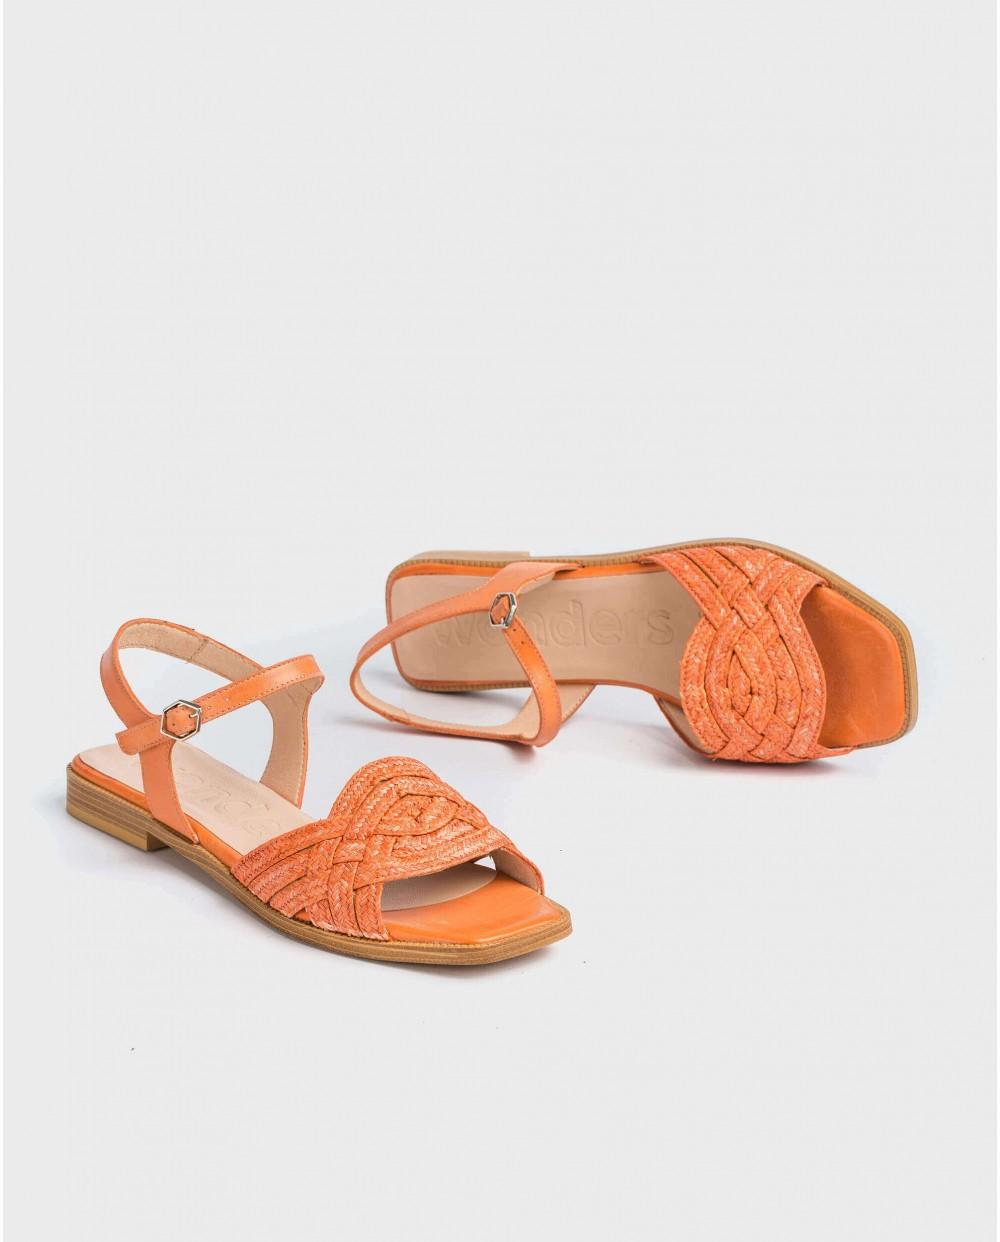 Wonders-Outlet-Sandal with raffia detail